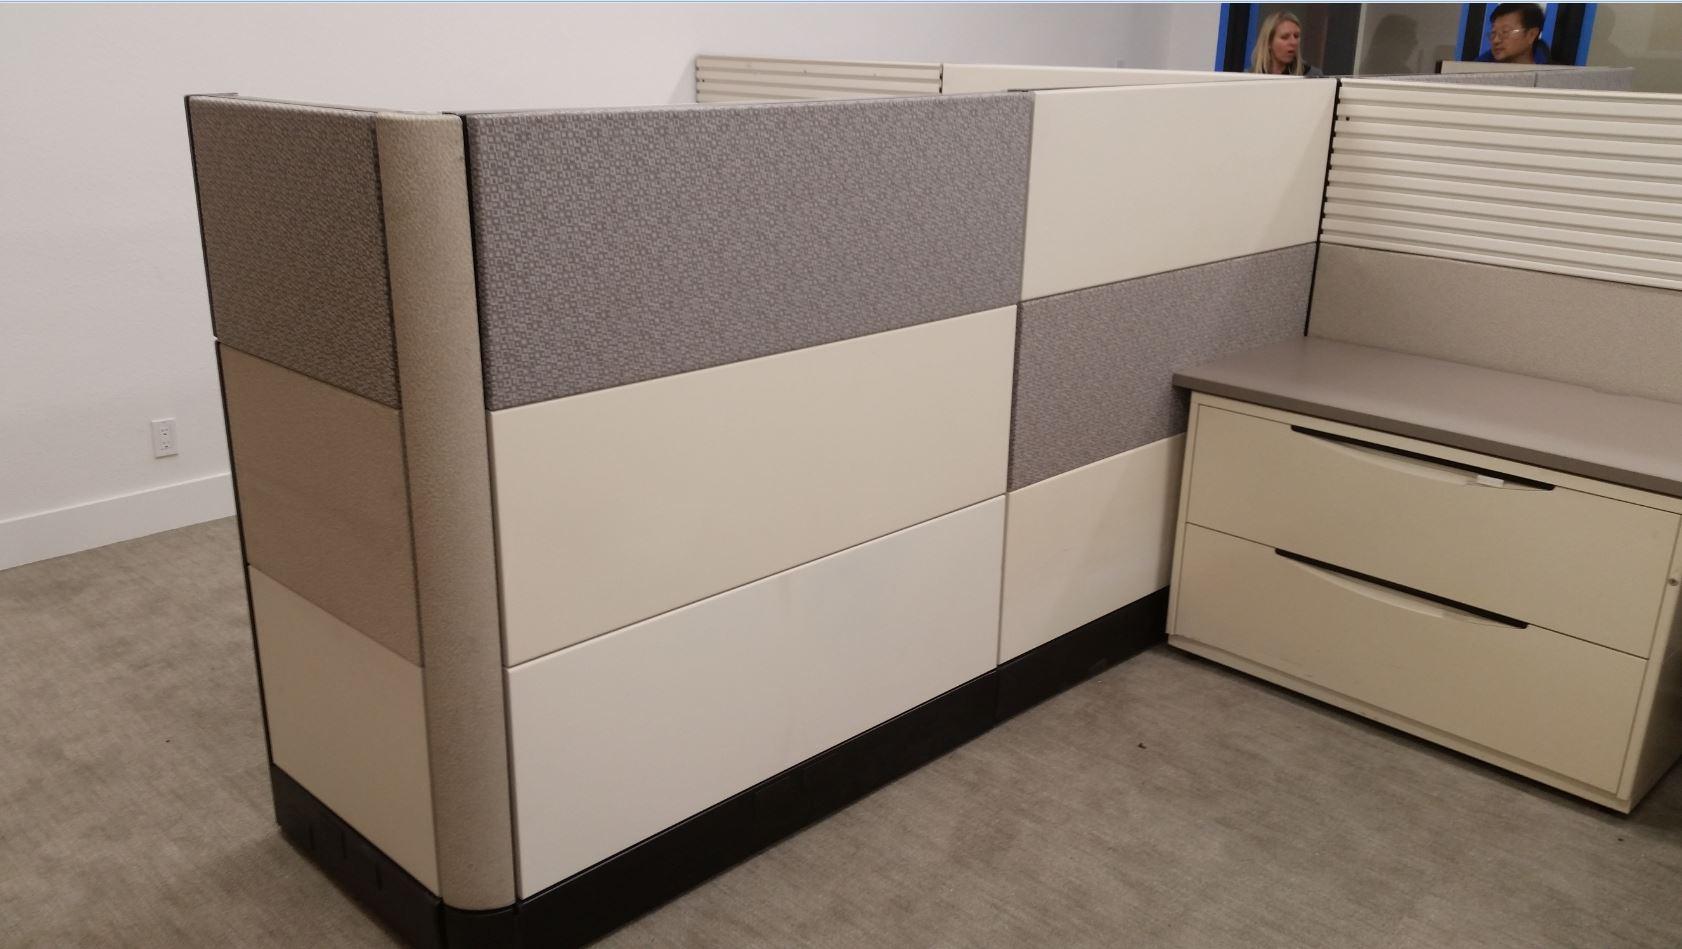 39 Herman Miller Office Furniture Cubicles Commercial Office Furniture Sarasota Fl New